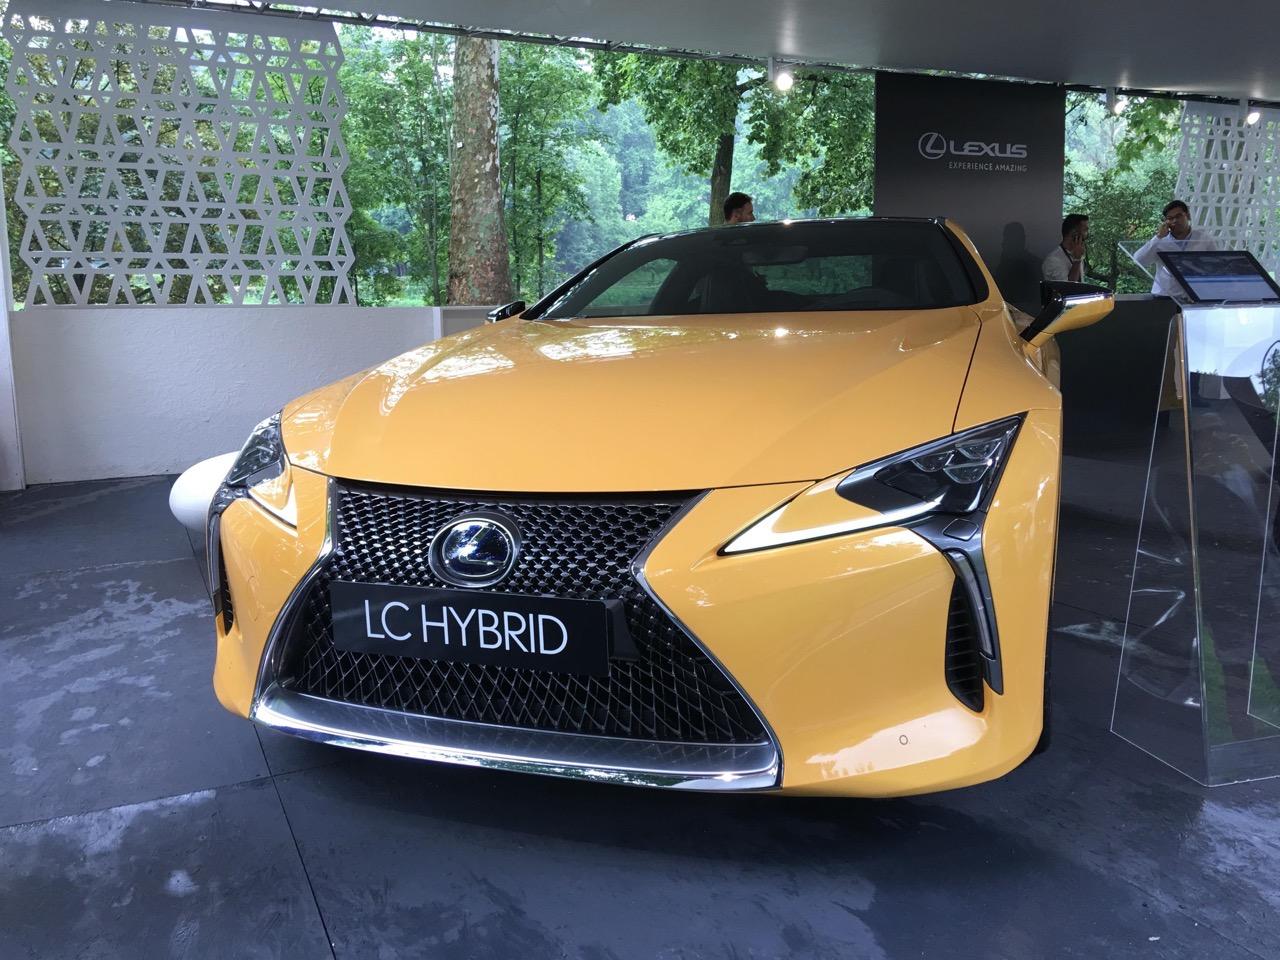 Lexus LC Hybrid - Parco Valentino 2018